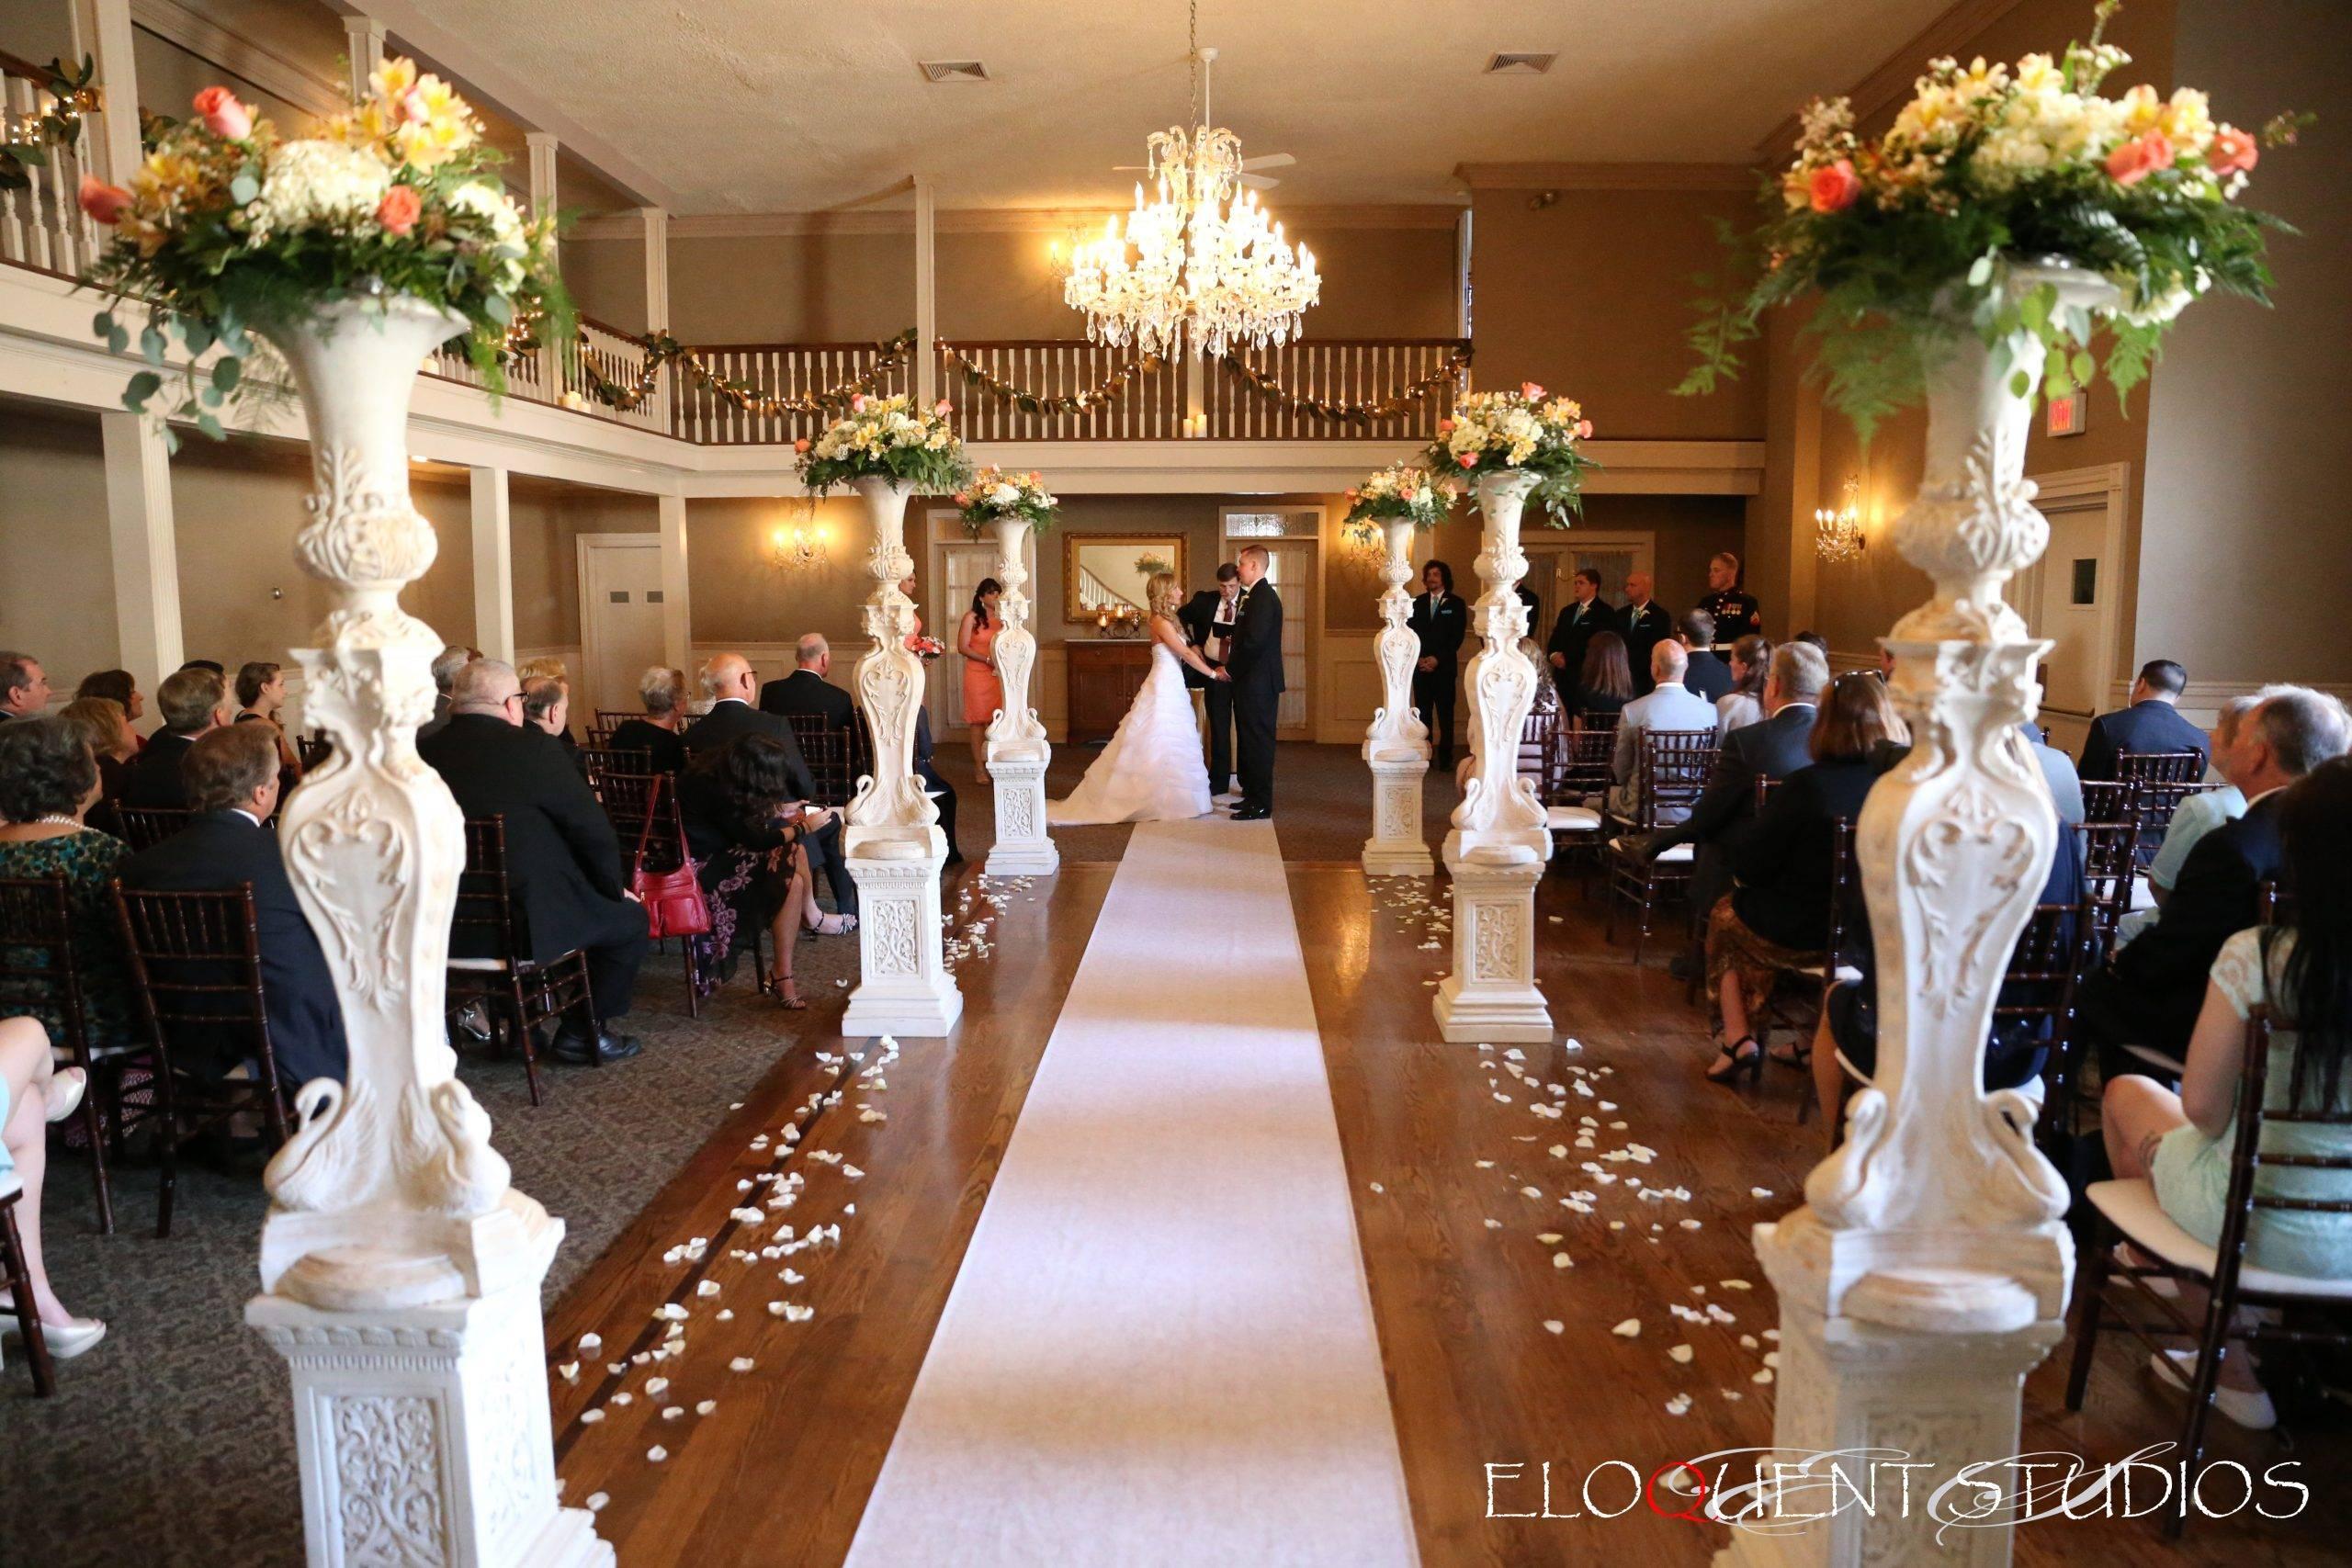 David's Country Inn indoor wedding ceremony